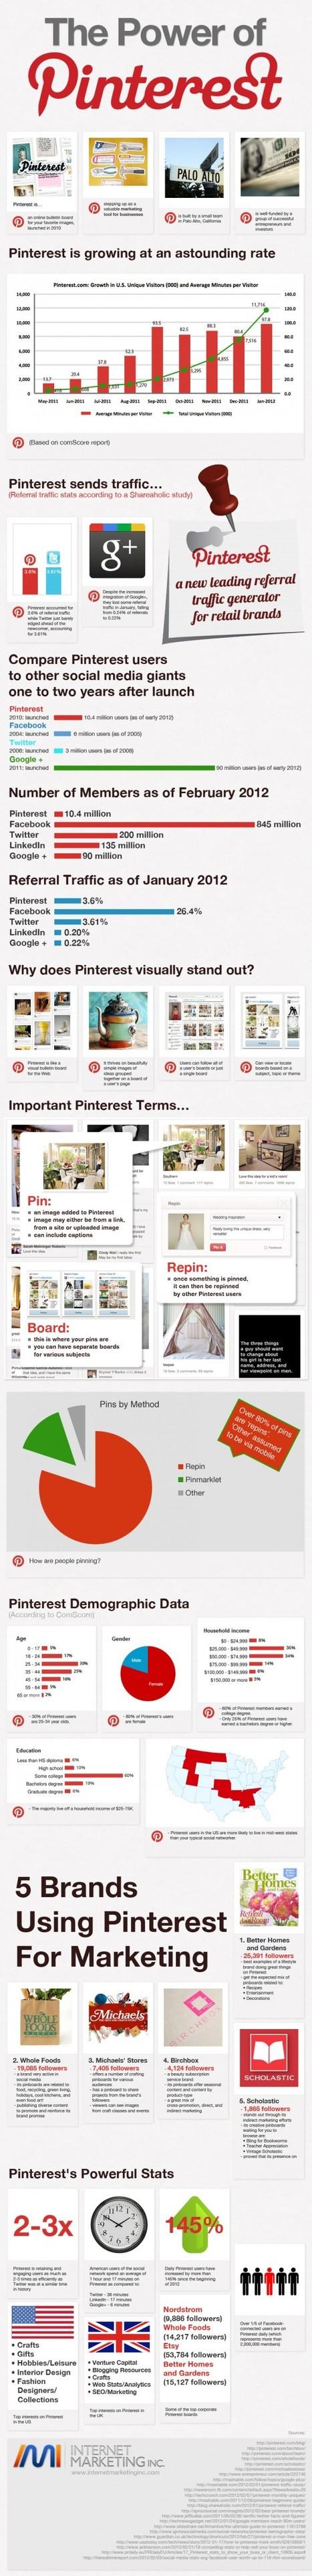 Pinterest vs. Other Social Media Giants [Infographic] - SocialTimes | Everything Pinterest | Scoop.it